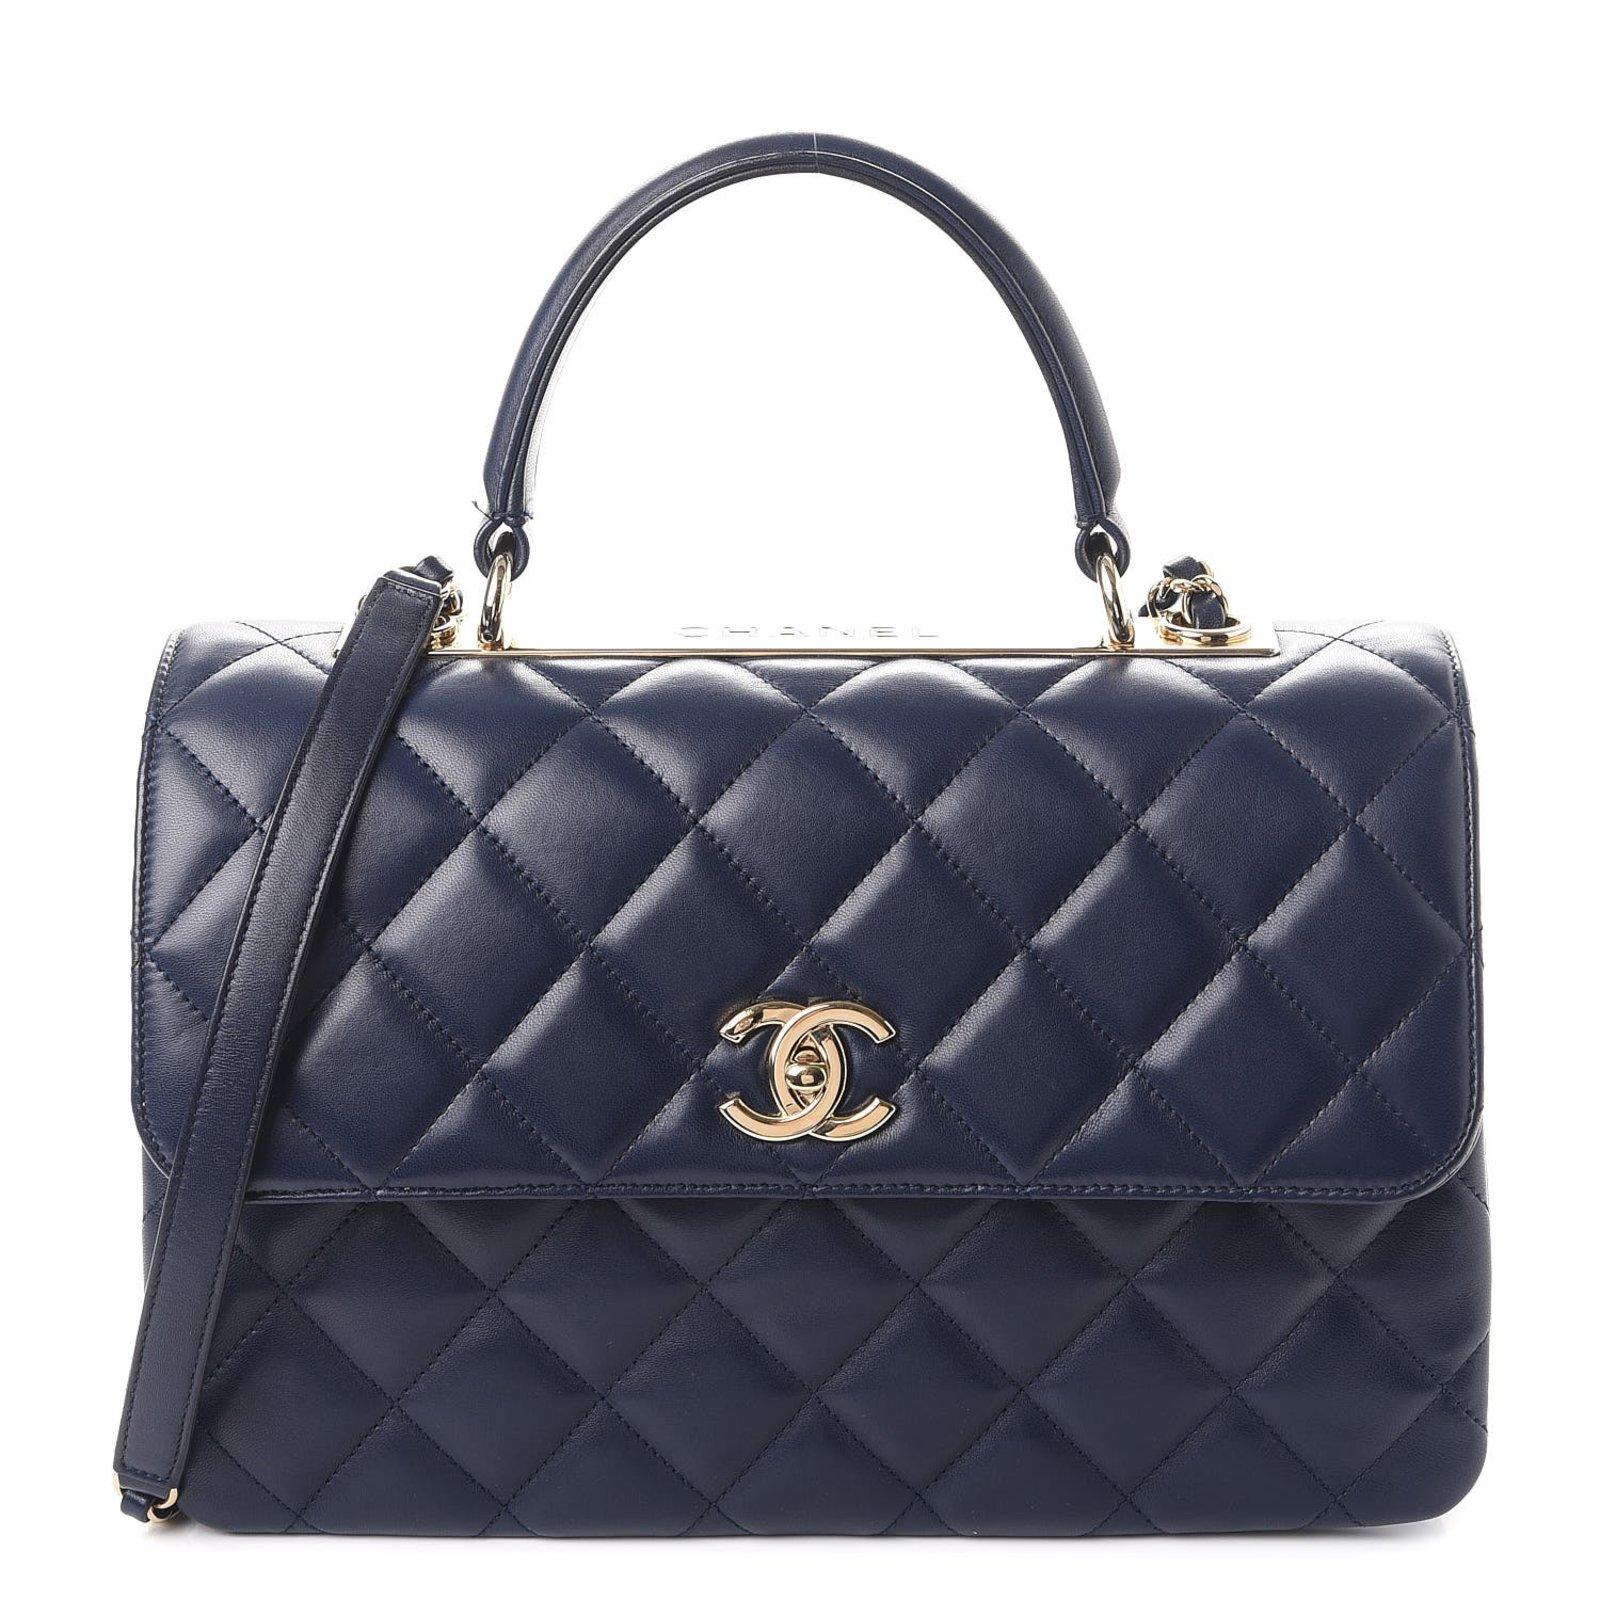 18cd5d5fb12d0b Chanel Like Handbags - Foto Handbag All Collections Salonagafiya.Com